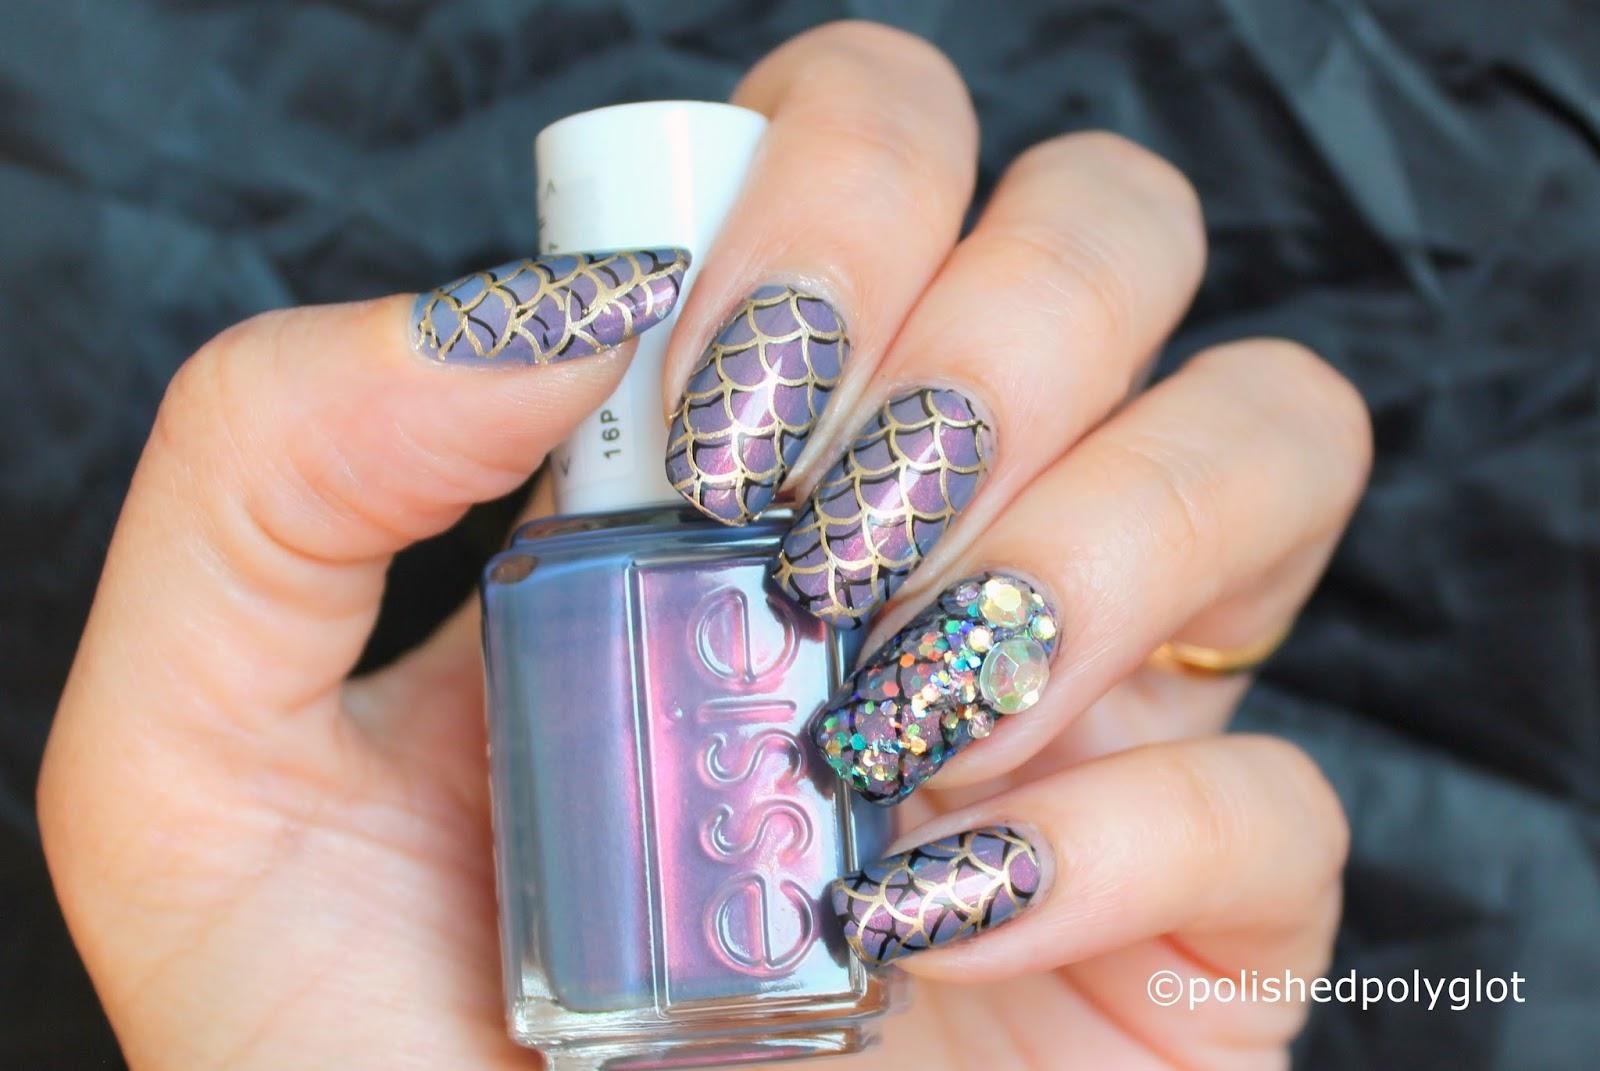 Nail Art │ Multichrome Mermaid Nails [26 Great Nail Art Ideas ...